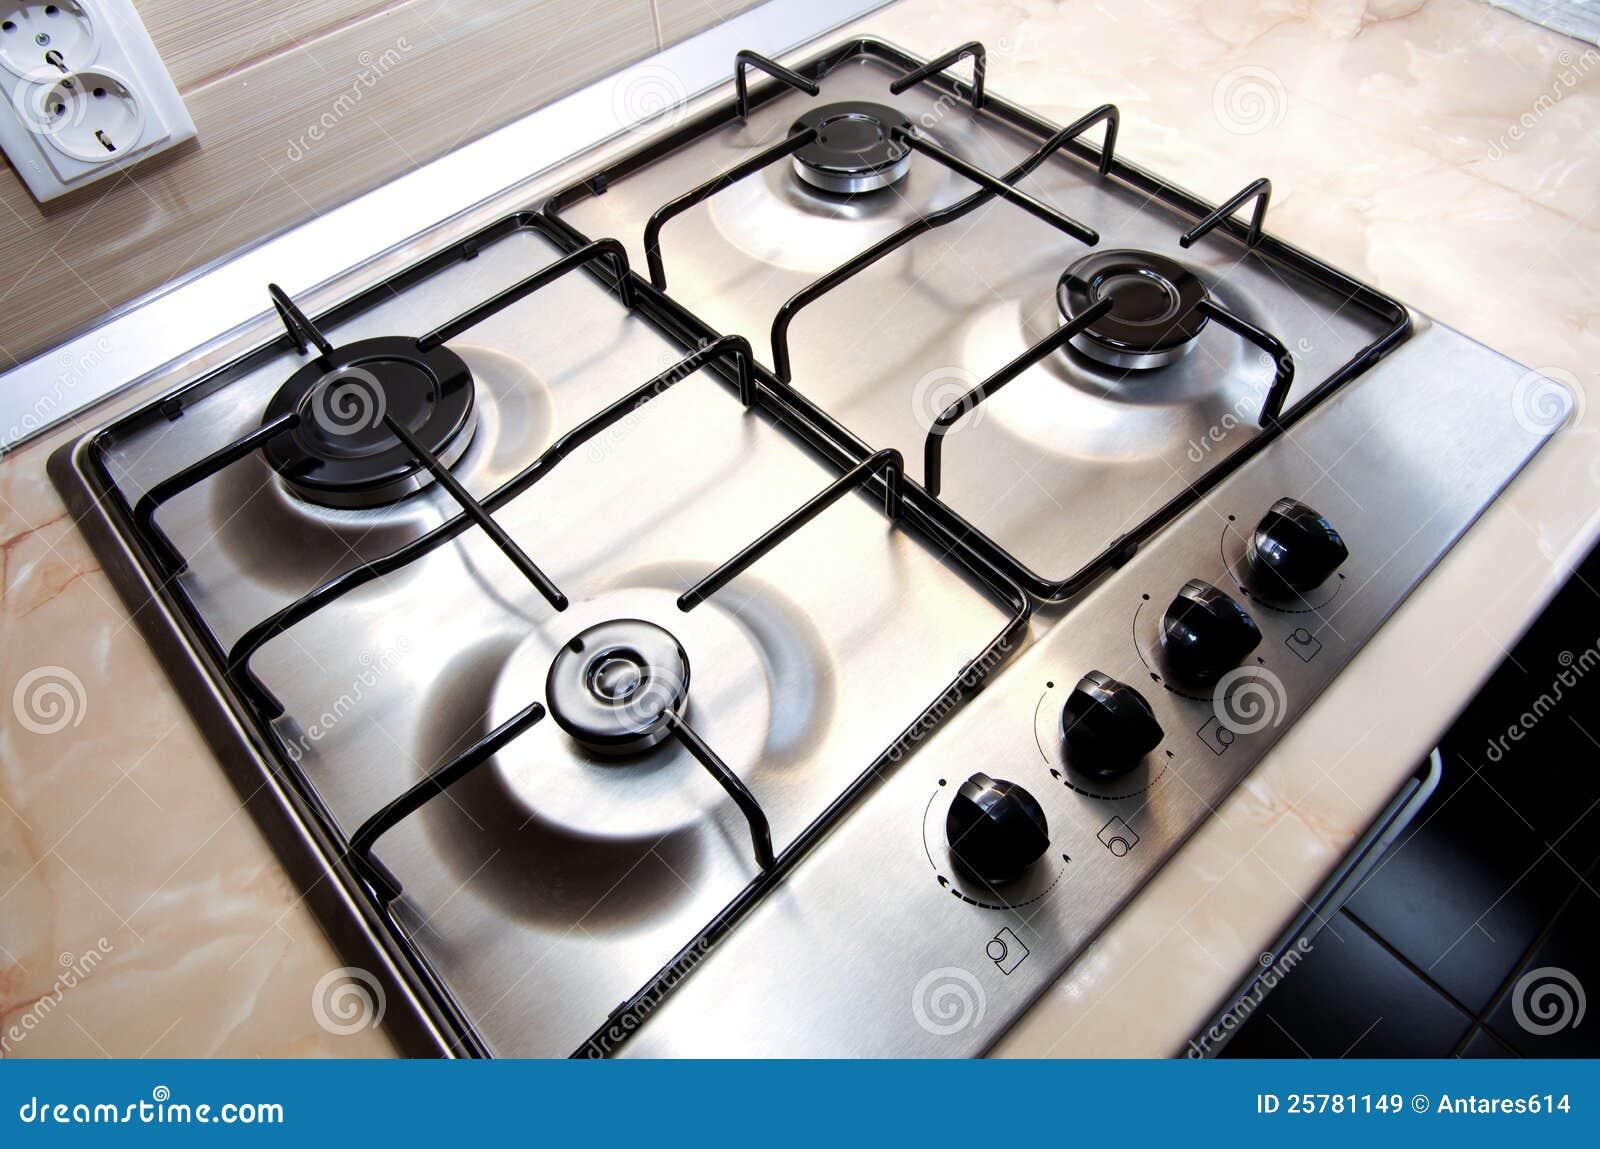 Stufa di cucina immagine stock immagine di disegno casa - Consumo gas cucina ...